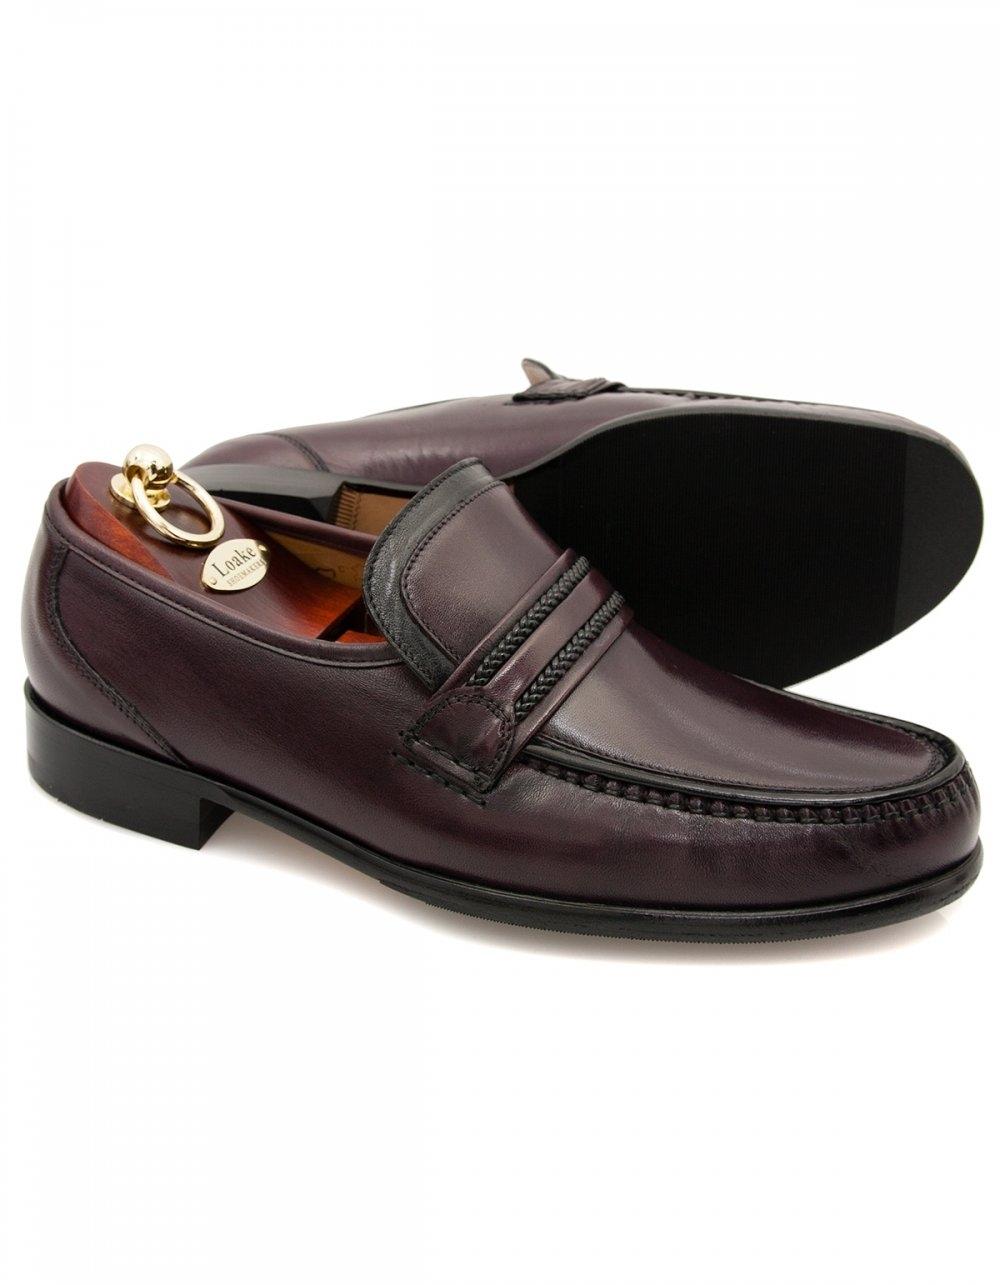 068b67b03b961 Rome Nappa Leather Moccasins - Burgundy | Fields Menswear